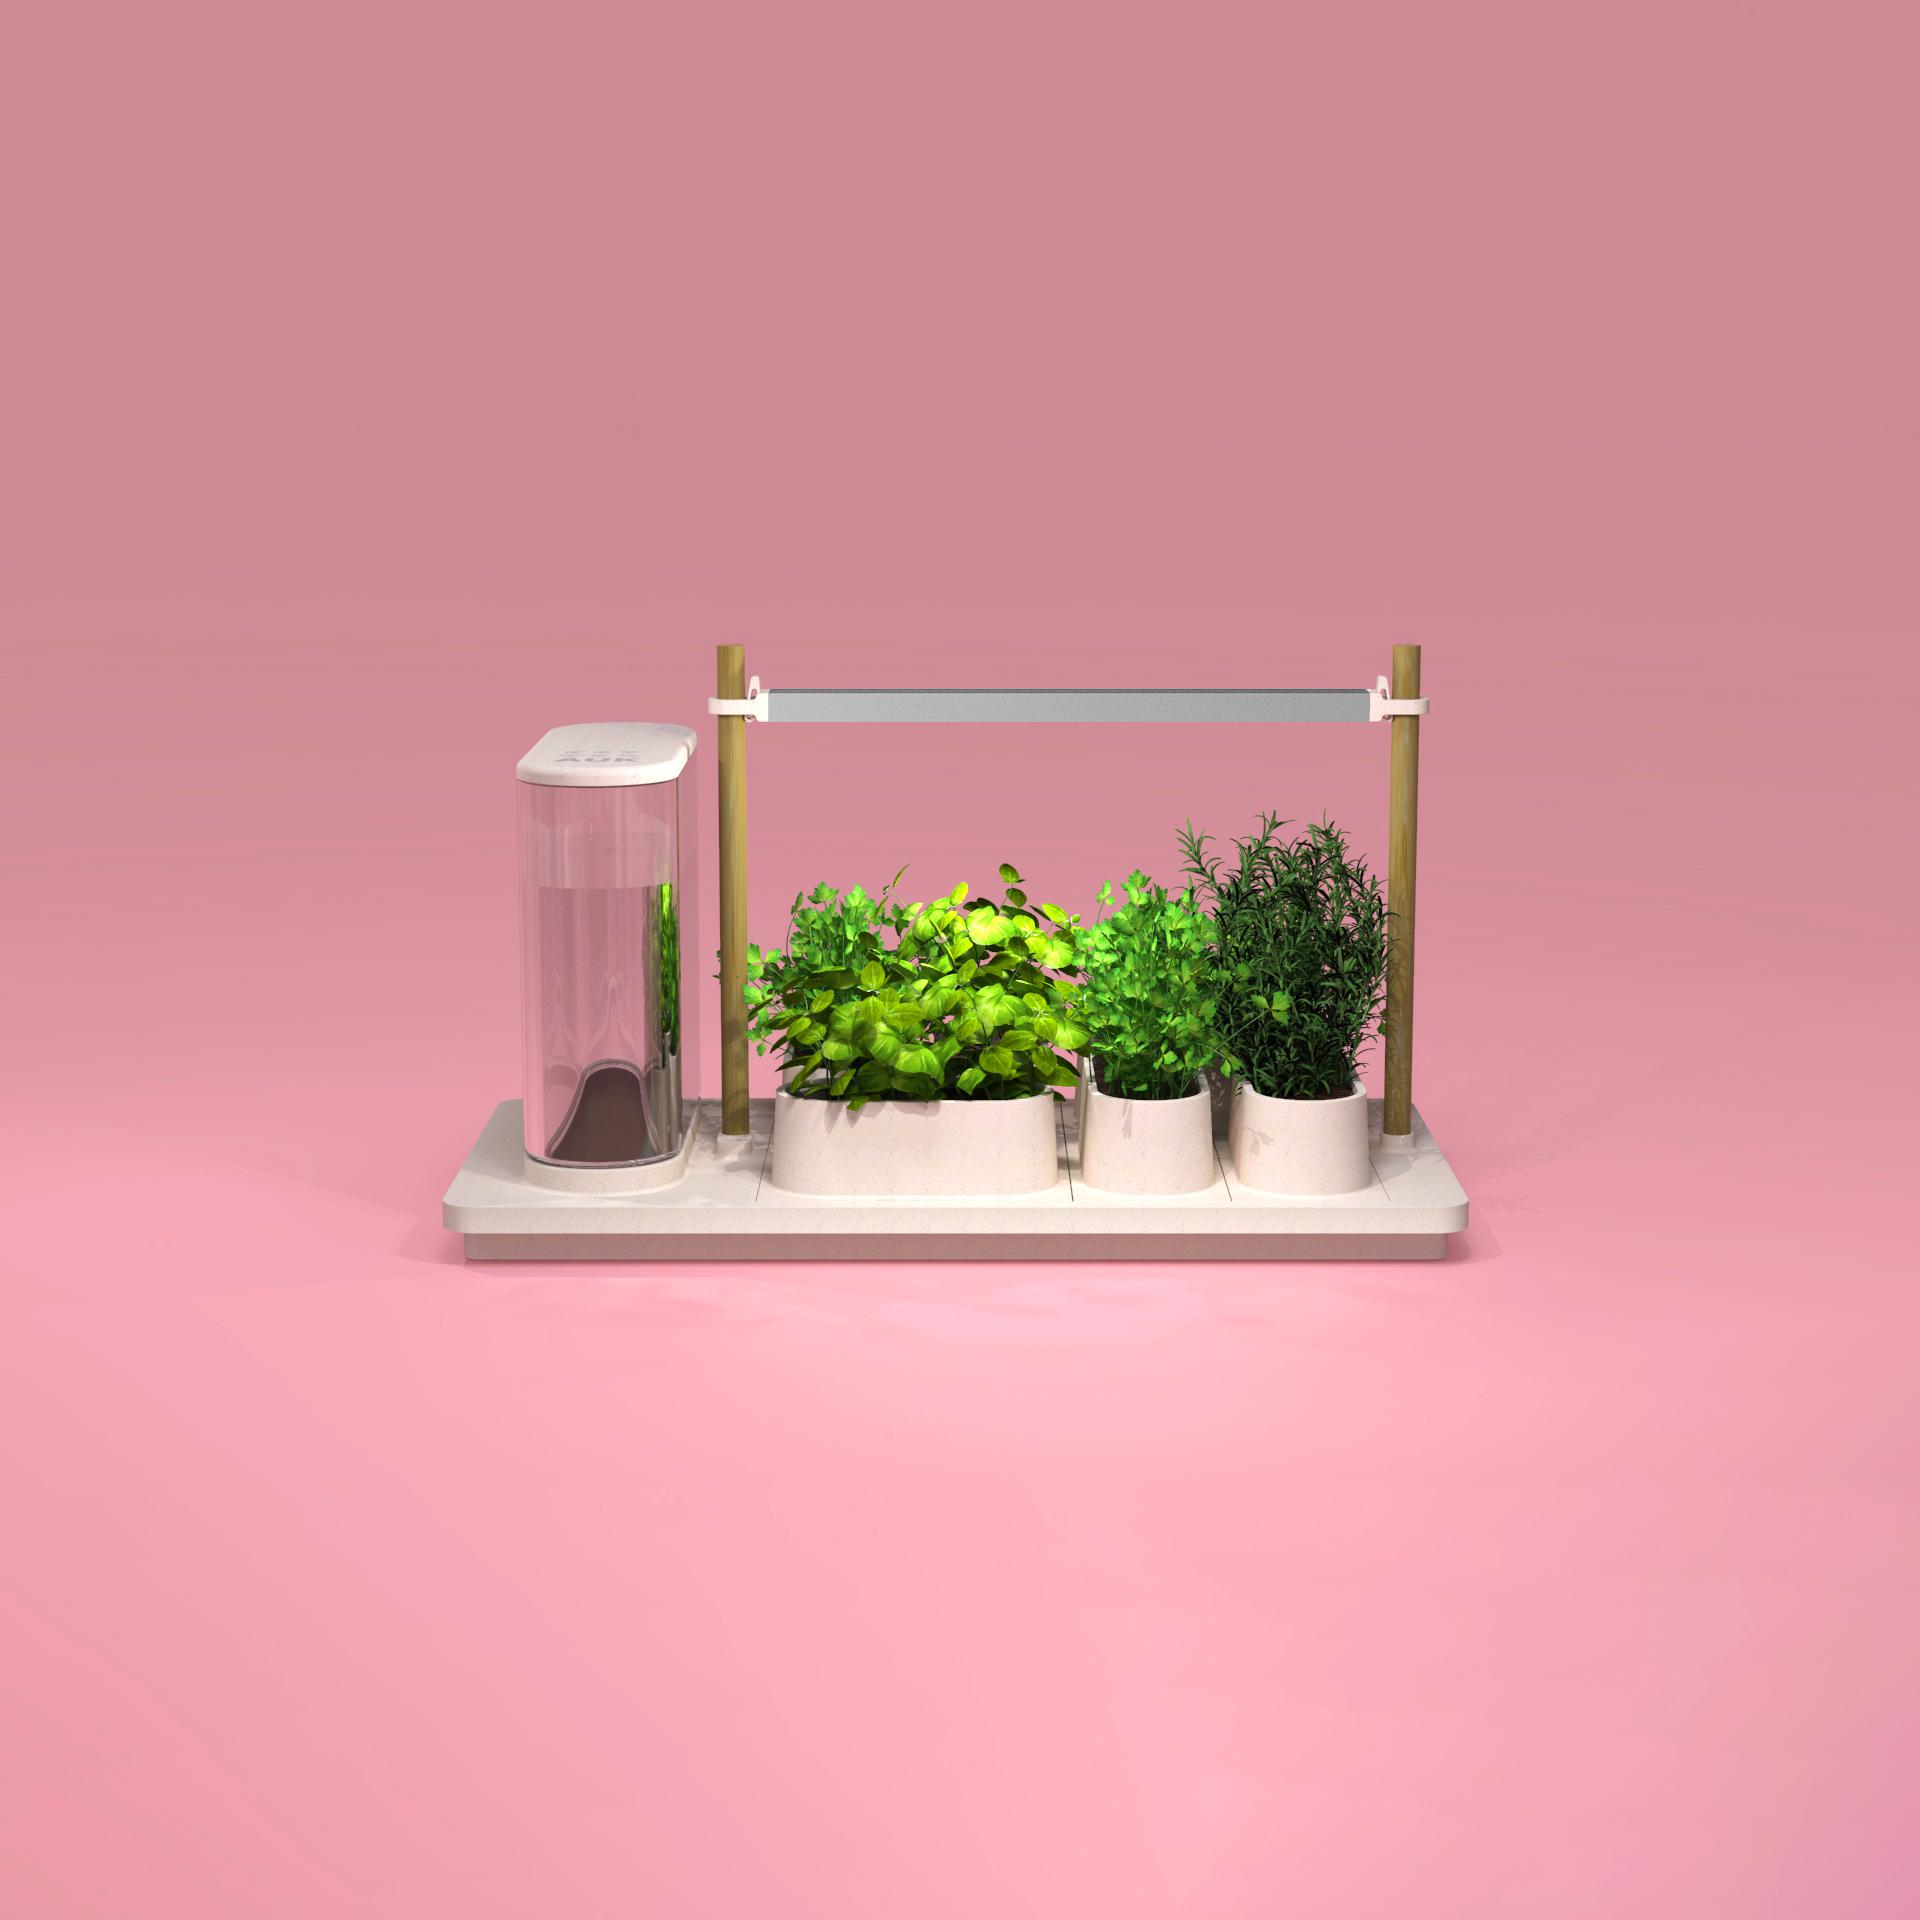 Auk_render_pink.jpg